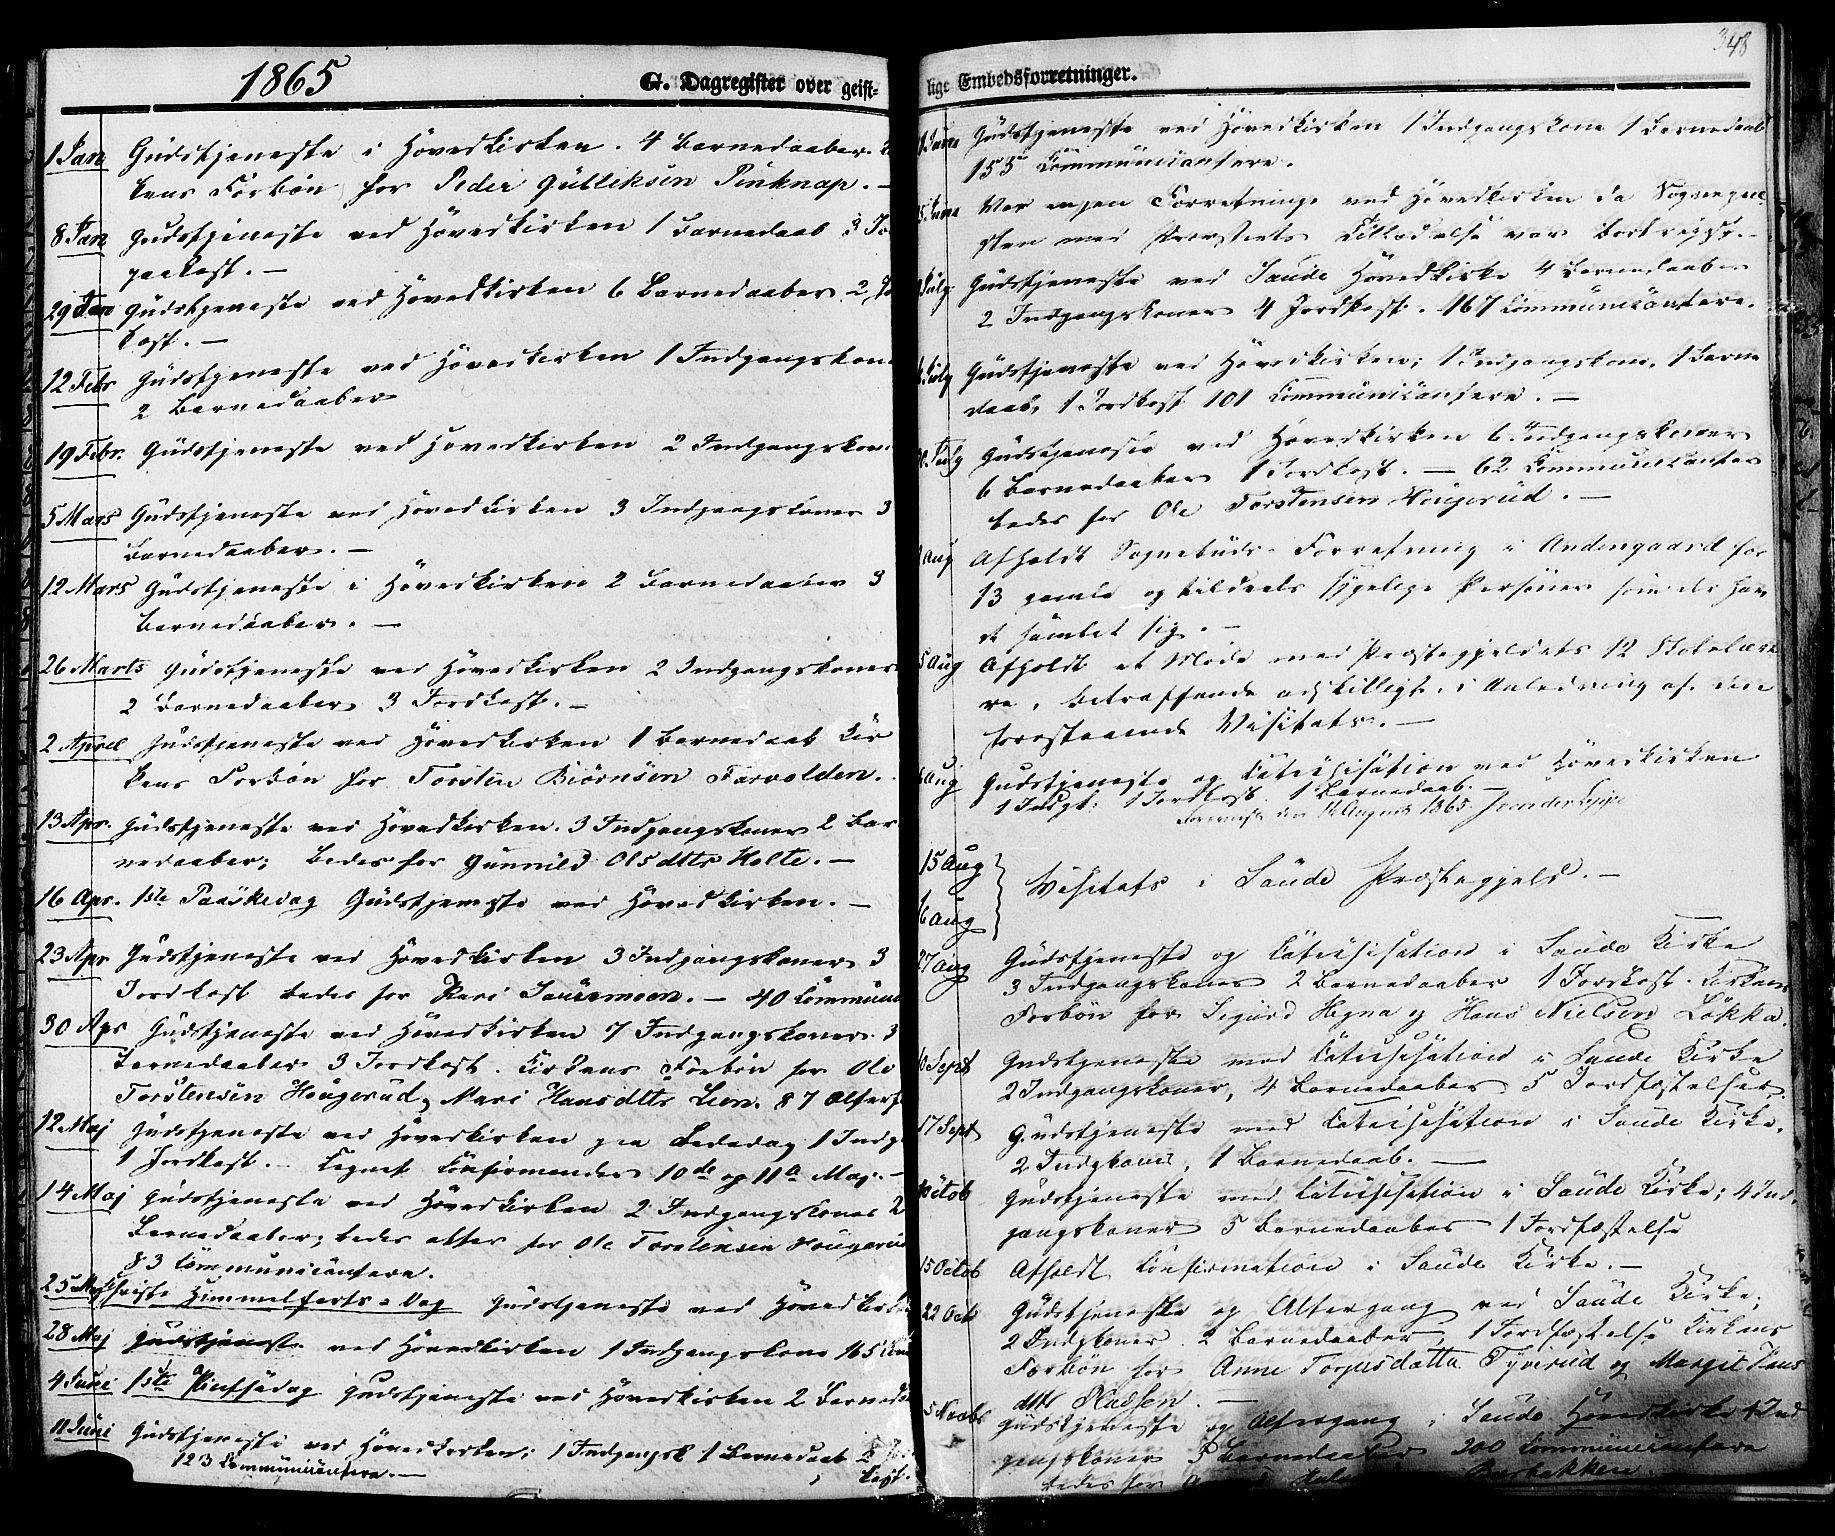 SAKO, Sauherad kirkebøker, F/Fa/L0007: Ministerialbok nr. I 7, 1851-1873, s. 348